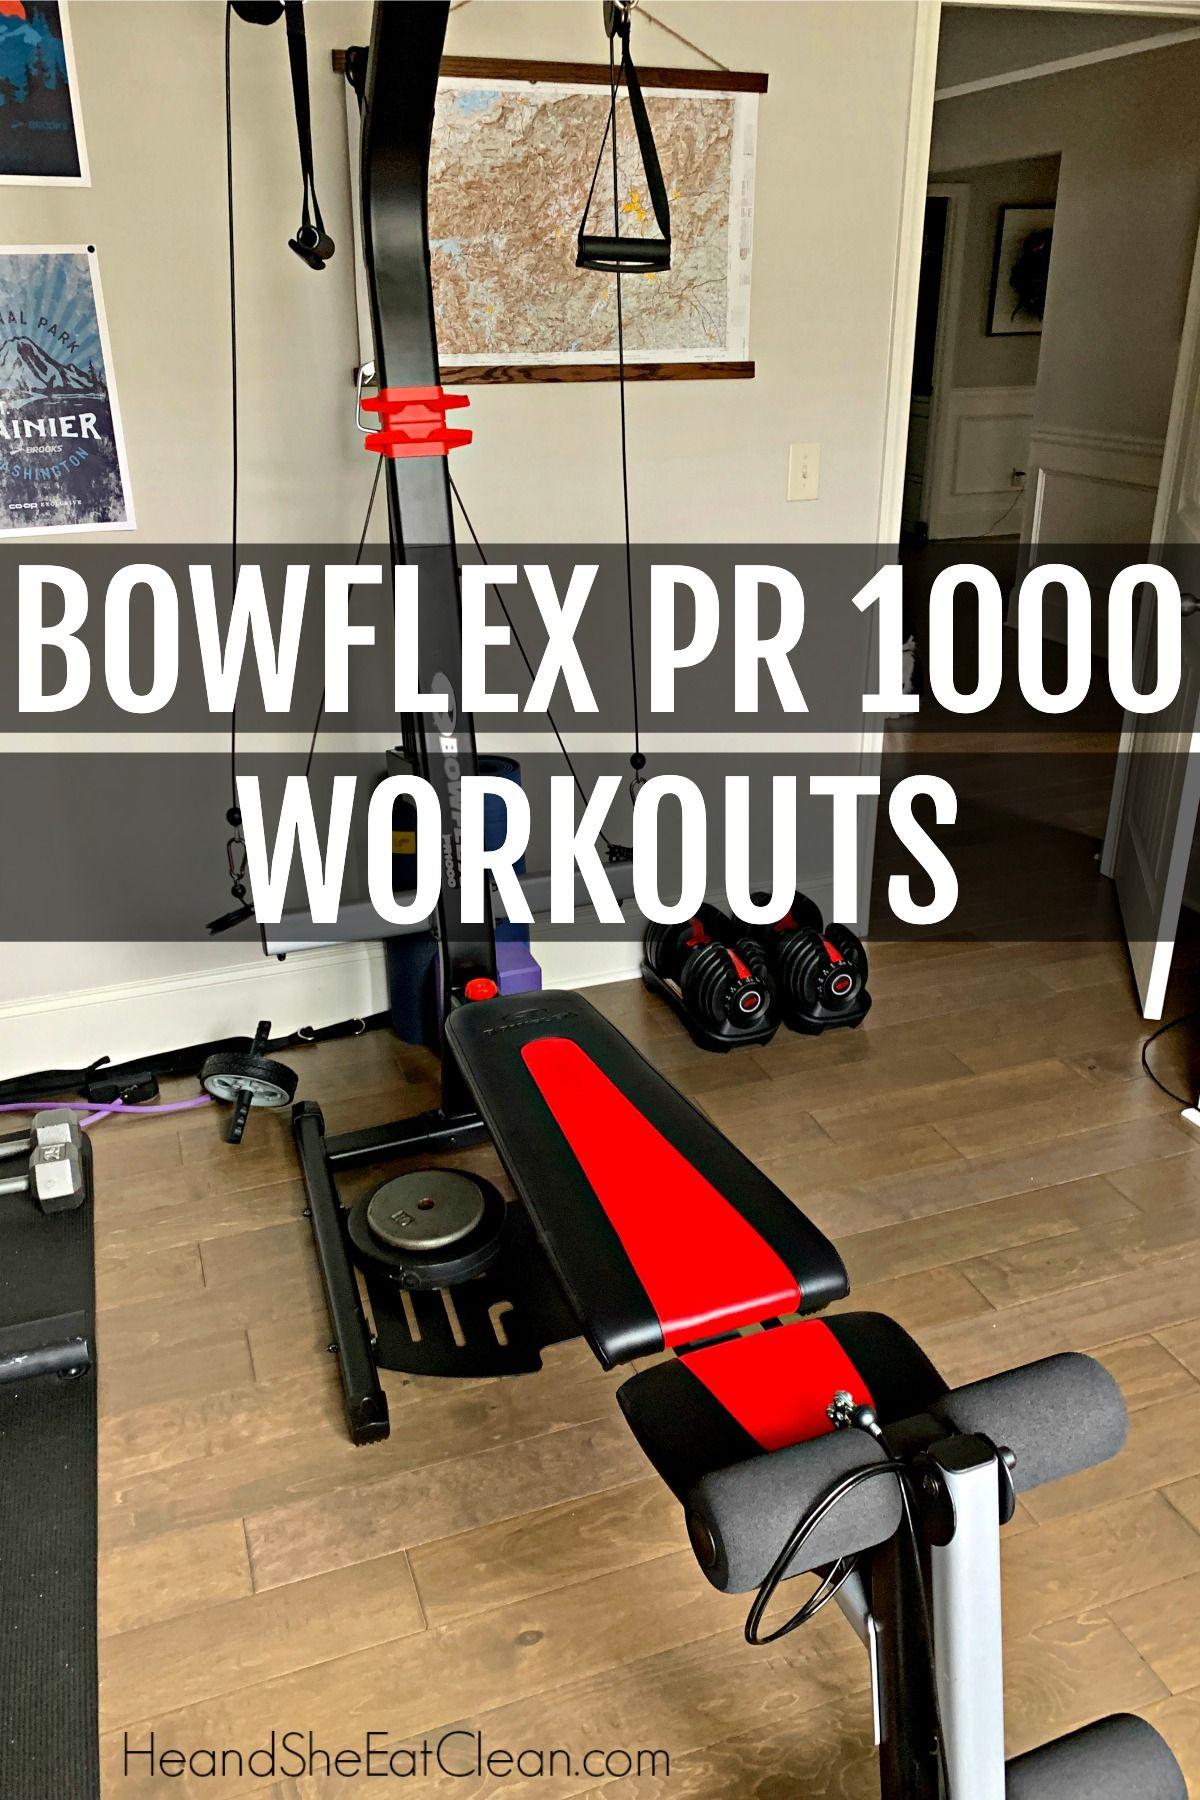 Bowflex pr1000 workouts with video in 2020 bowflex